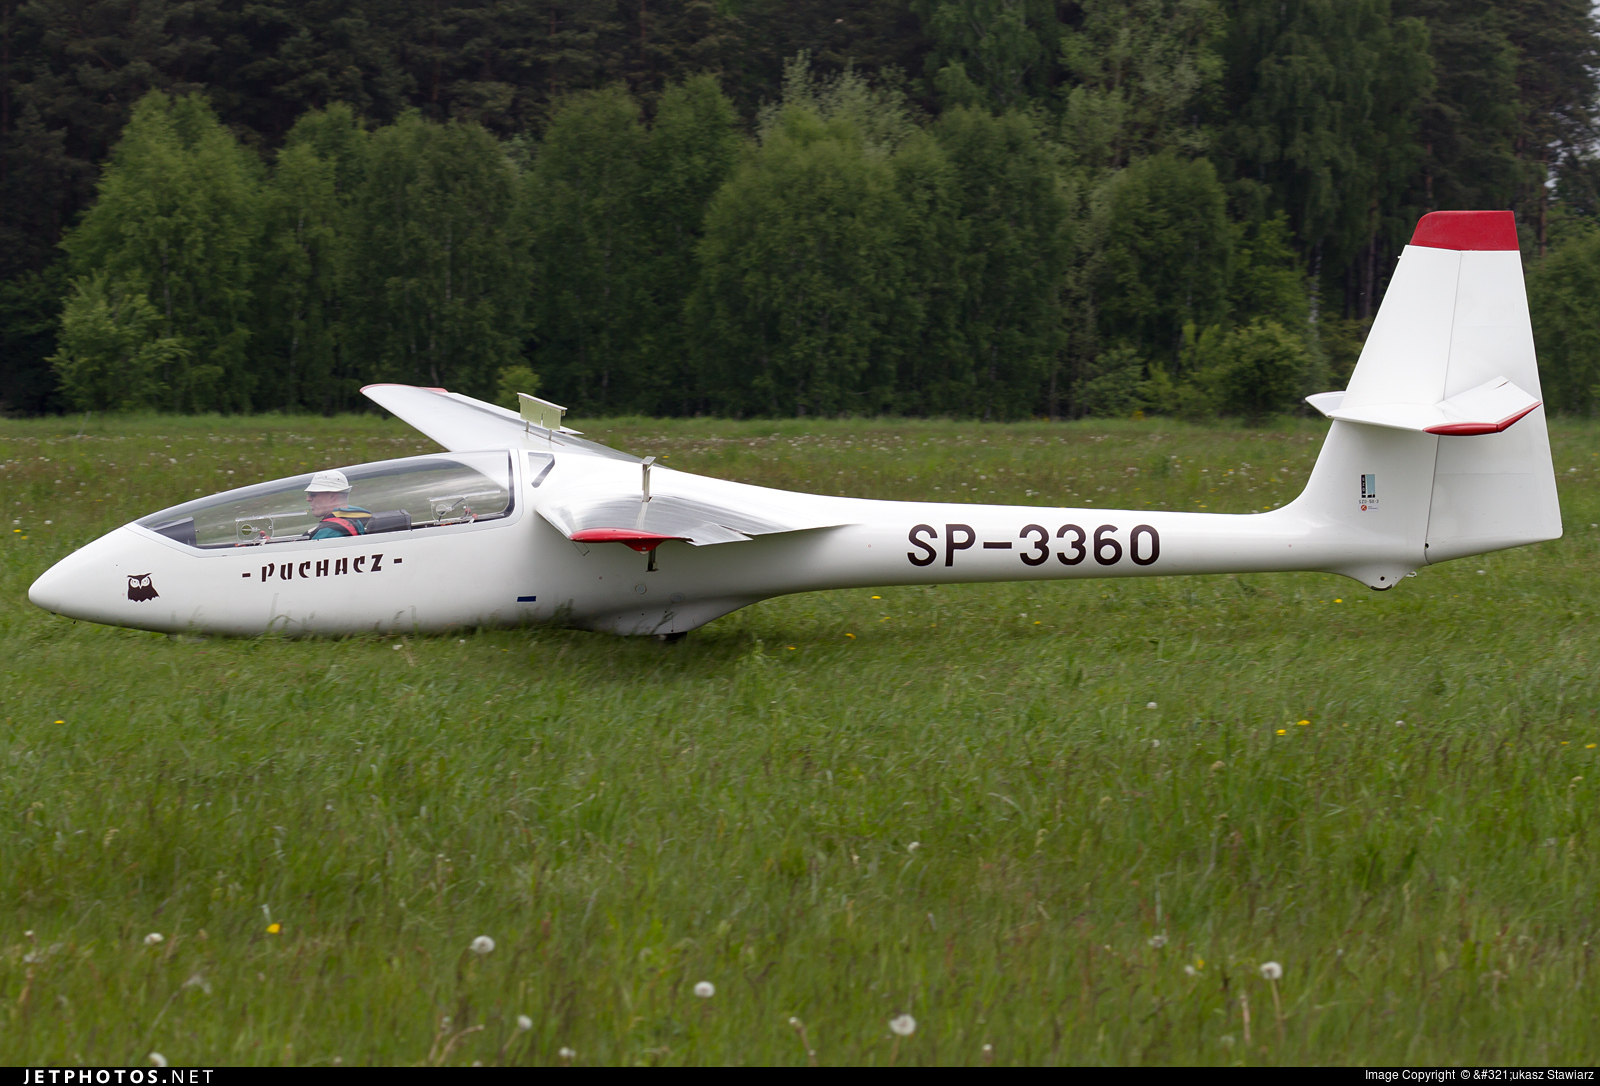 SP-3360 - SZD 50-3 Puchacz - Aero Club - Slupsk